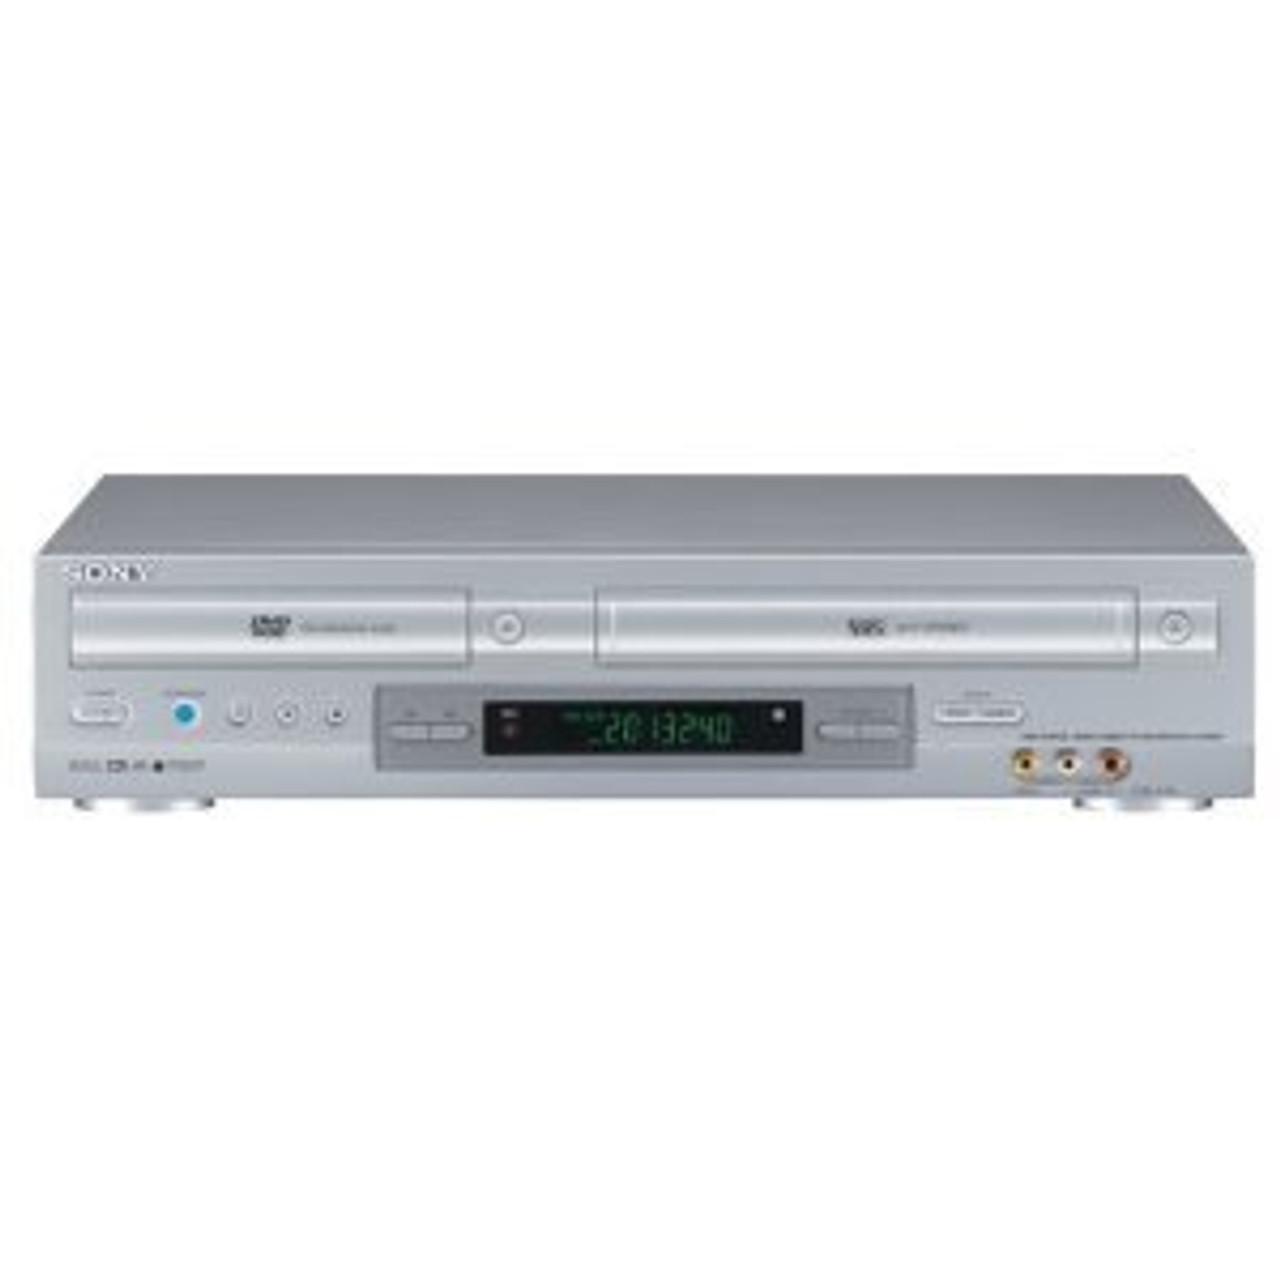 Sony SLV-D100 DVD-VCR Combo  (DVD player VCR recorder)